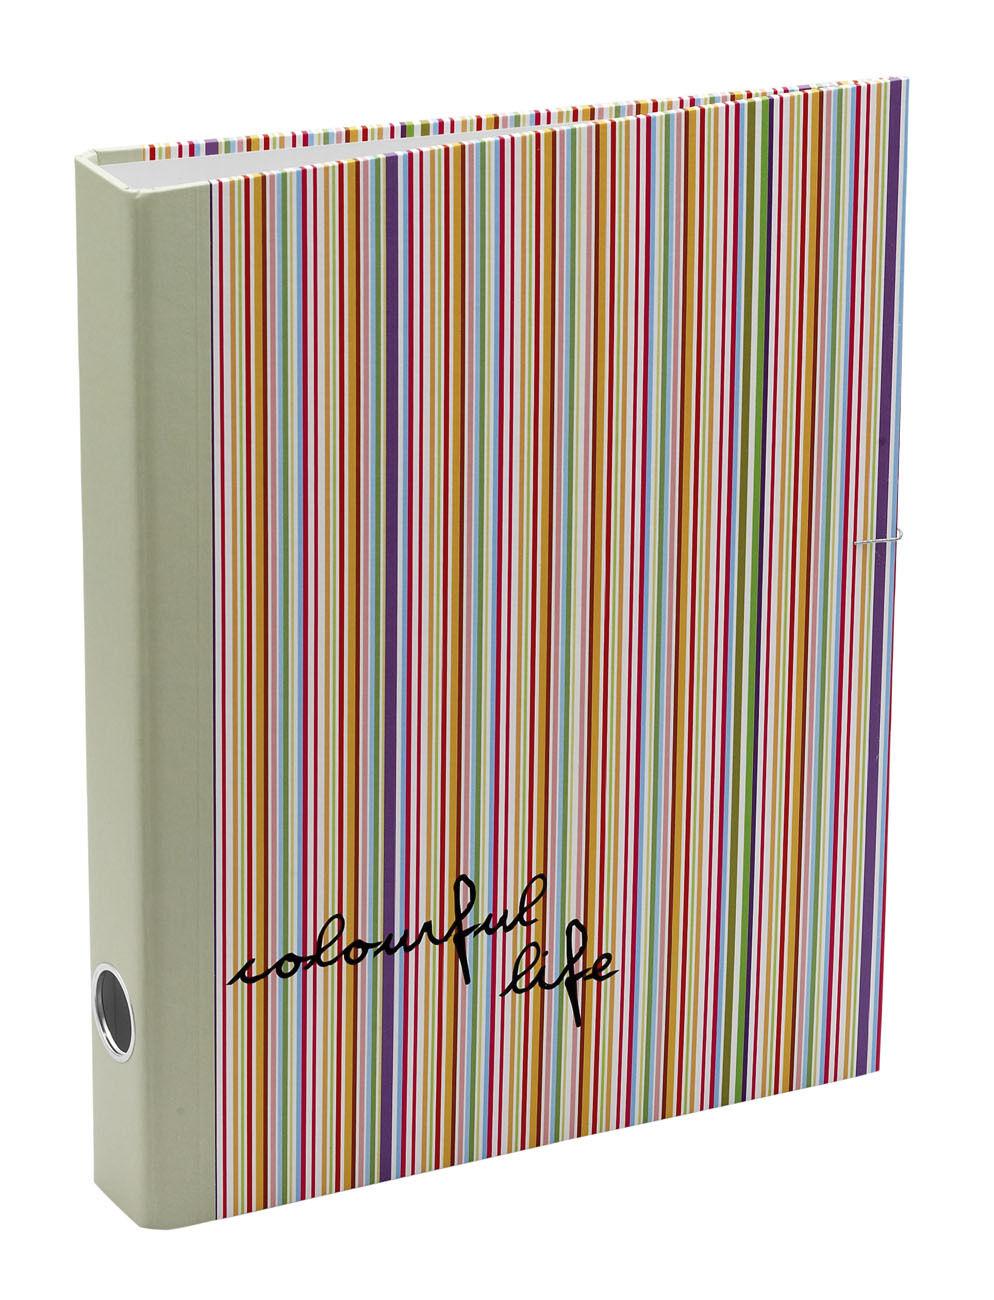 50 x Job Lot A4 Stripy Ring Binders Folder Office School Stationery By Katz